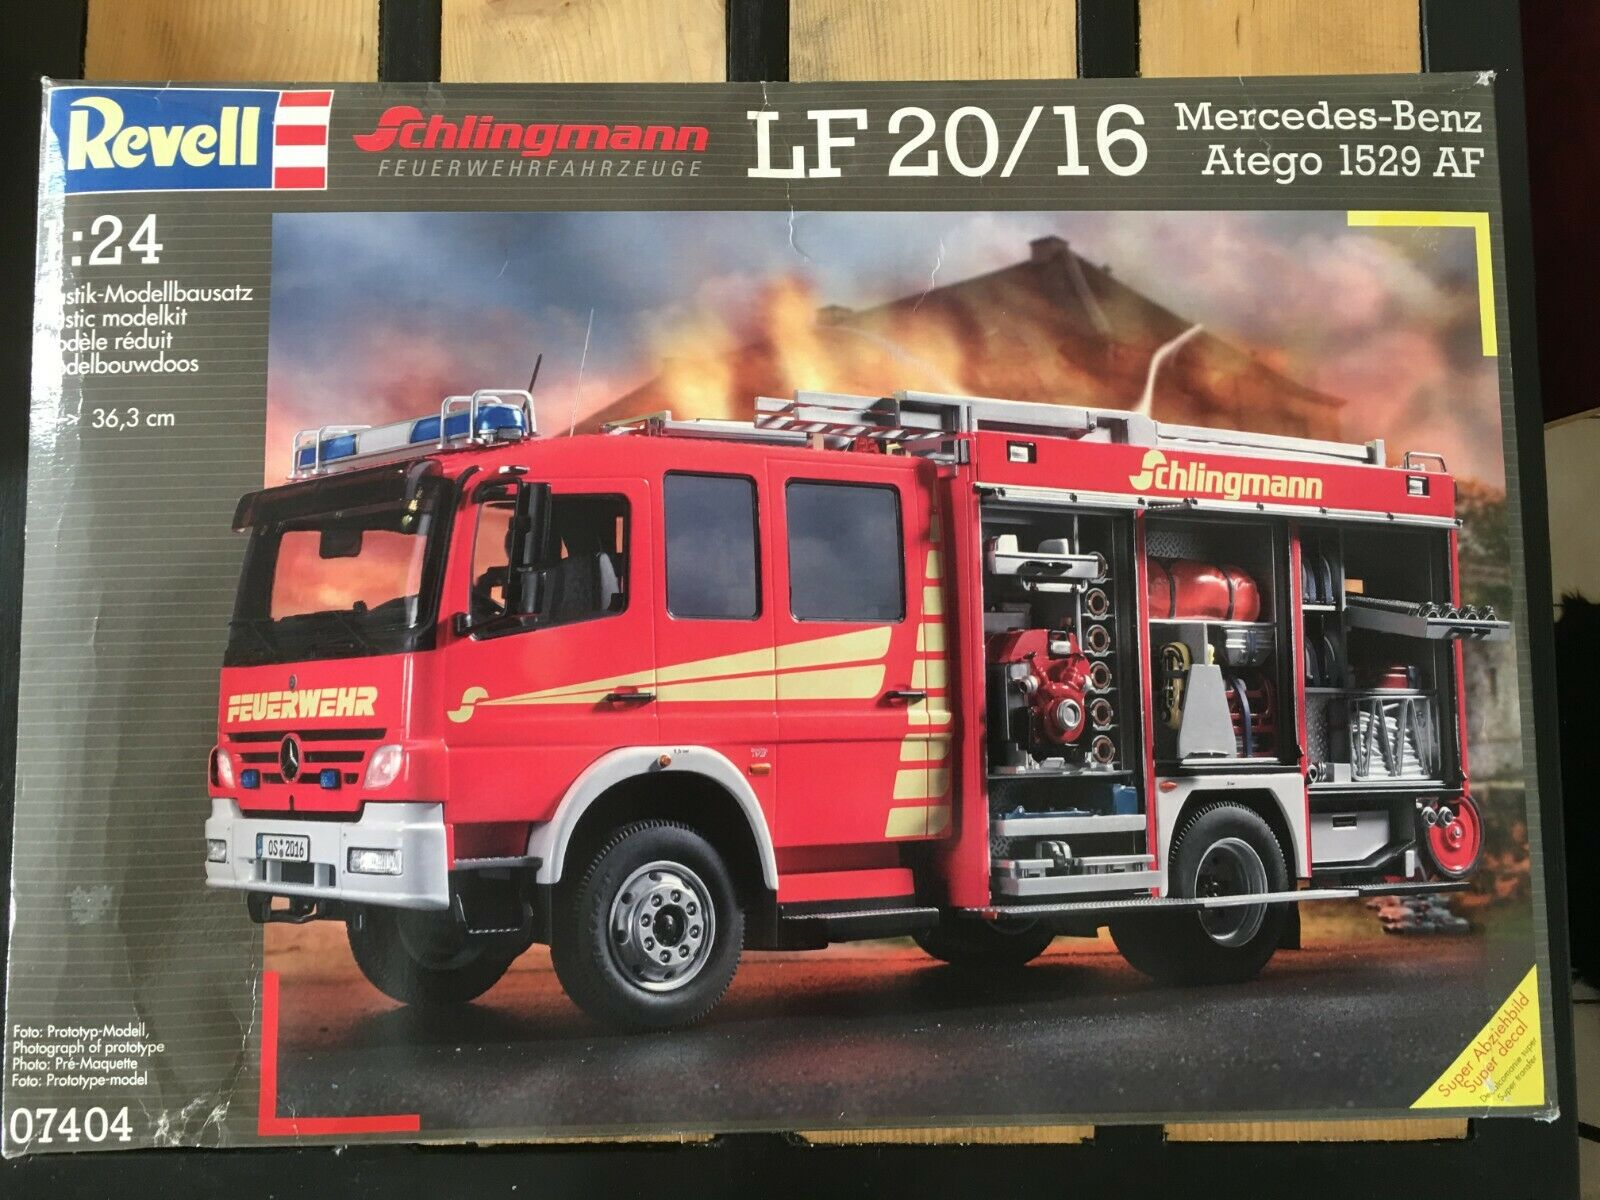 REVELL 07404 Camion Pompiers LF 2016 MercedesBenz Atego 1529 AF 124.